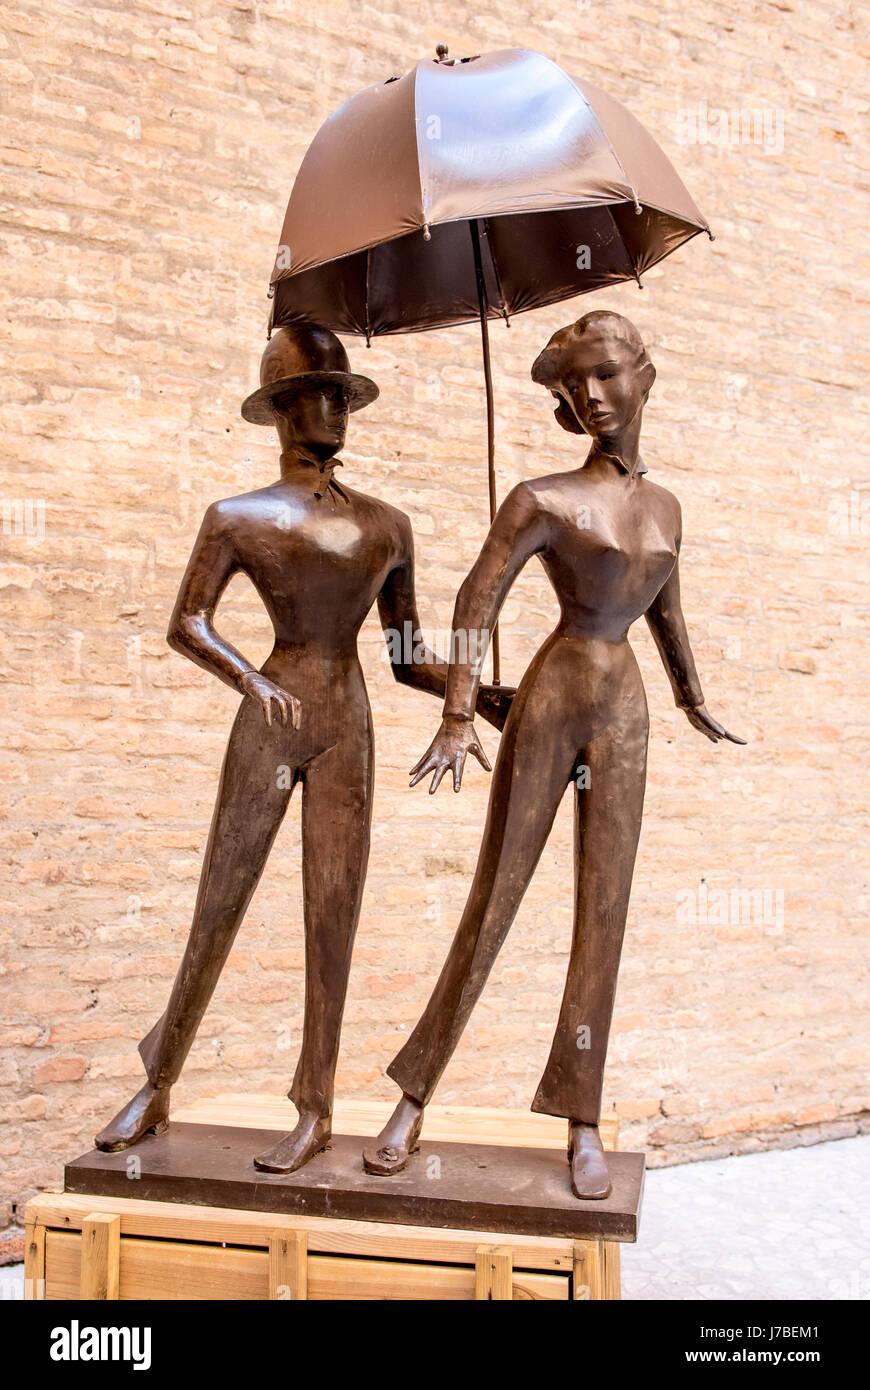 Bronze Sculpture of a couple with Umbrella Bologna Italy - Stock Image